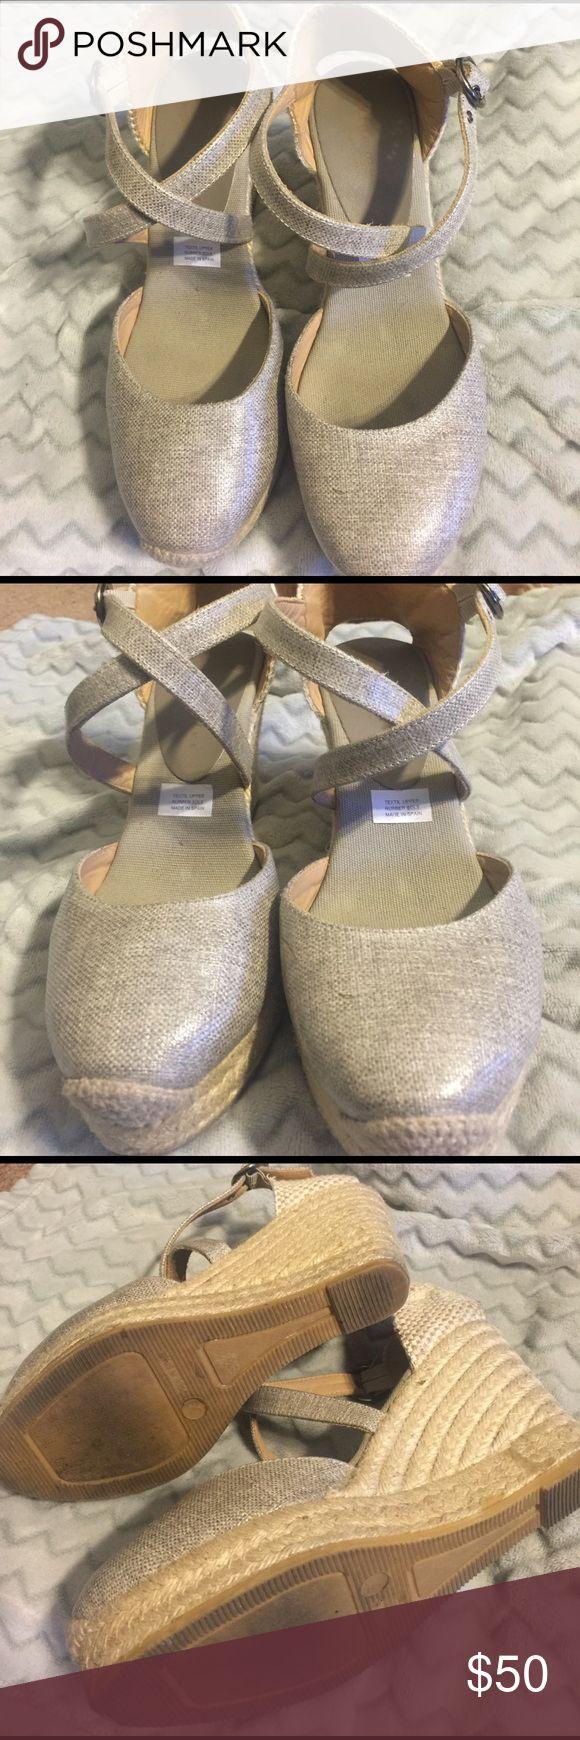 Silver espadrilles Bettye muller silver espadrilles.  Size 39 bettye muller  Shoes Espadrilles